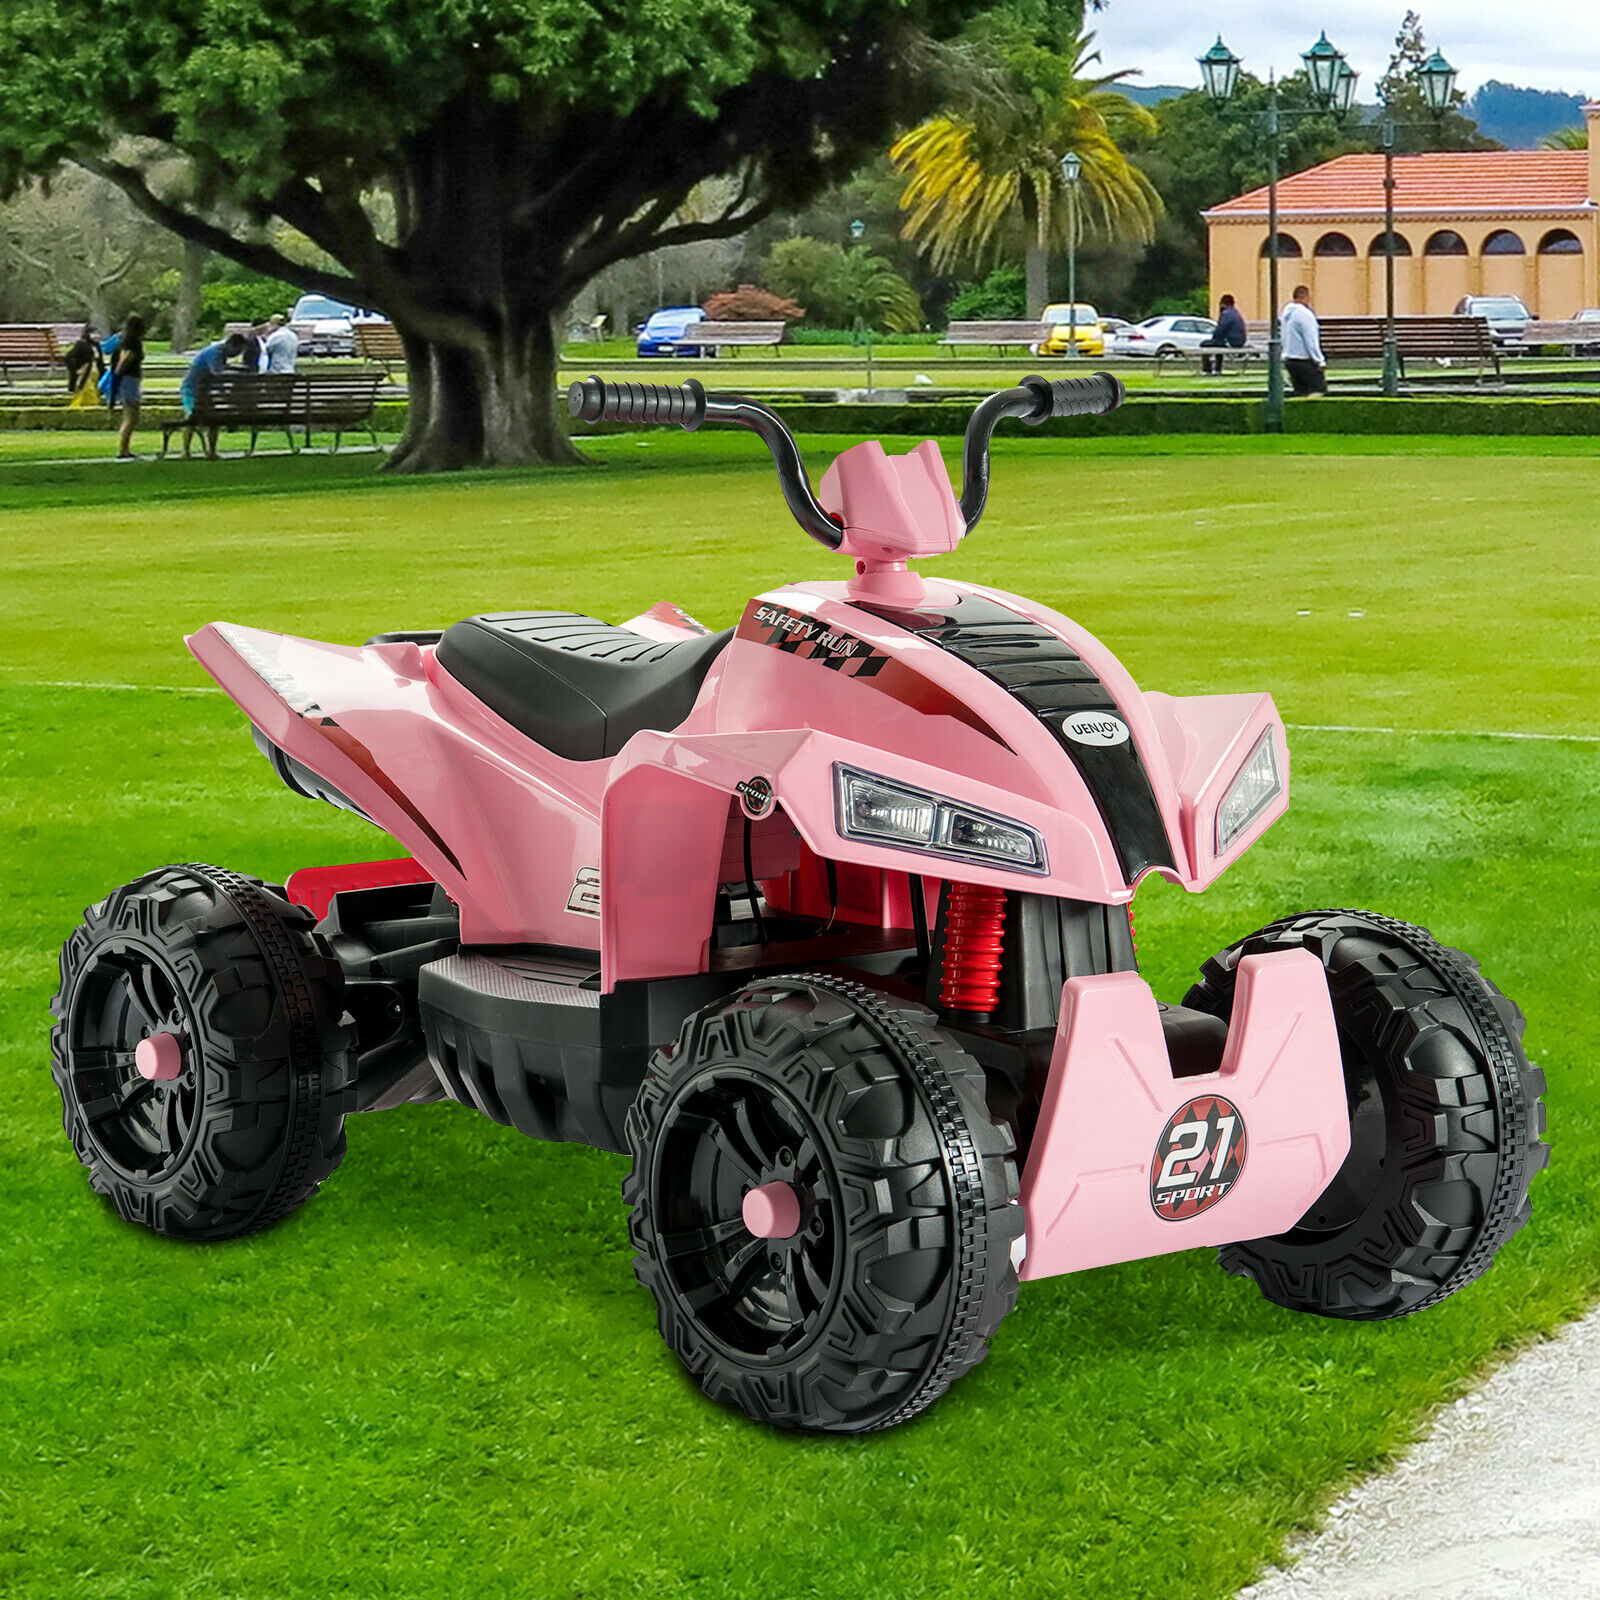 12V Quad Kindermotorrad Elektromotorrad Kinder Fahrzeug Elektro Auto Neu Rosa